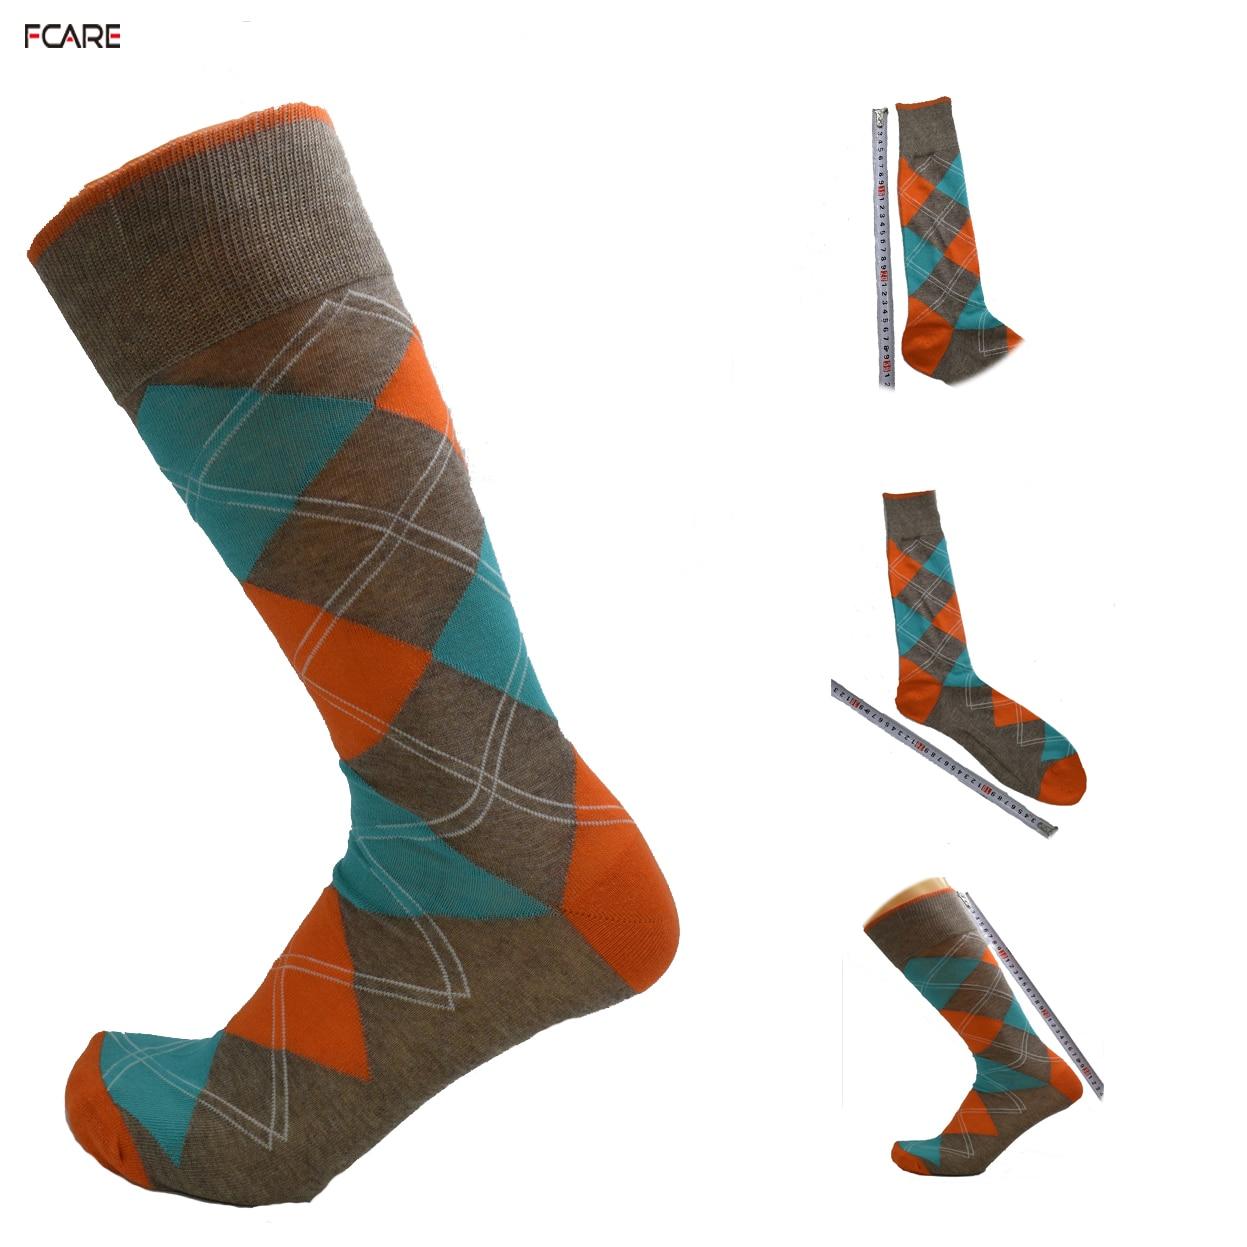 Fcare 1pair calcetines Mens crew plus size big Spring autumn winter long leg business crew socks